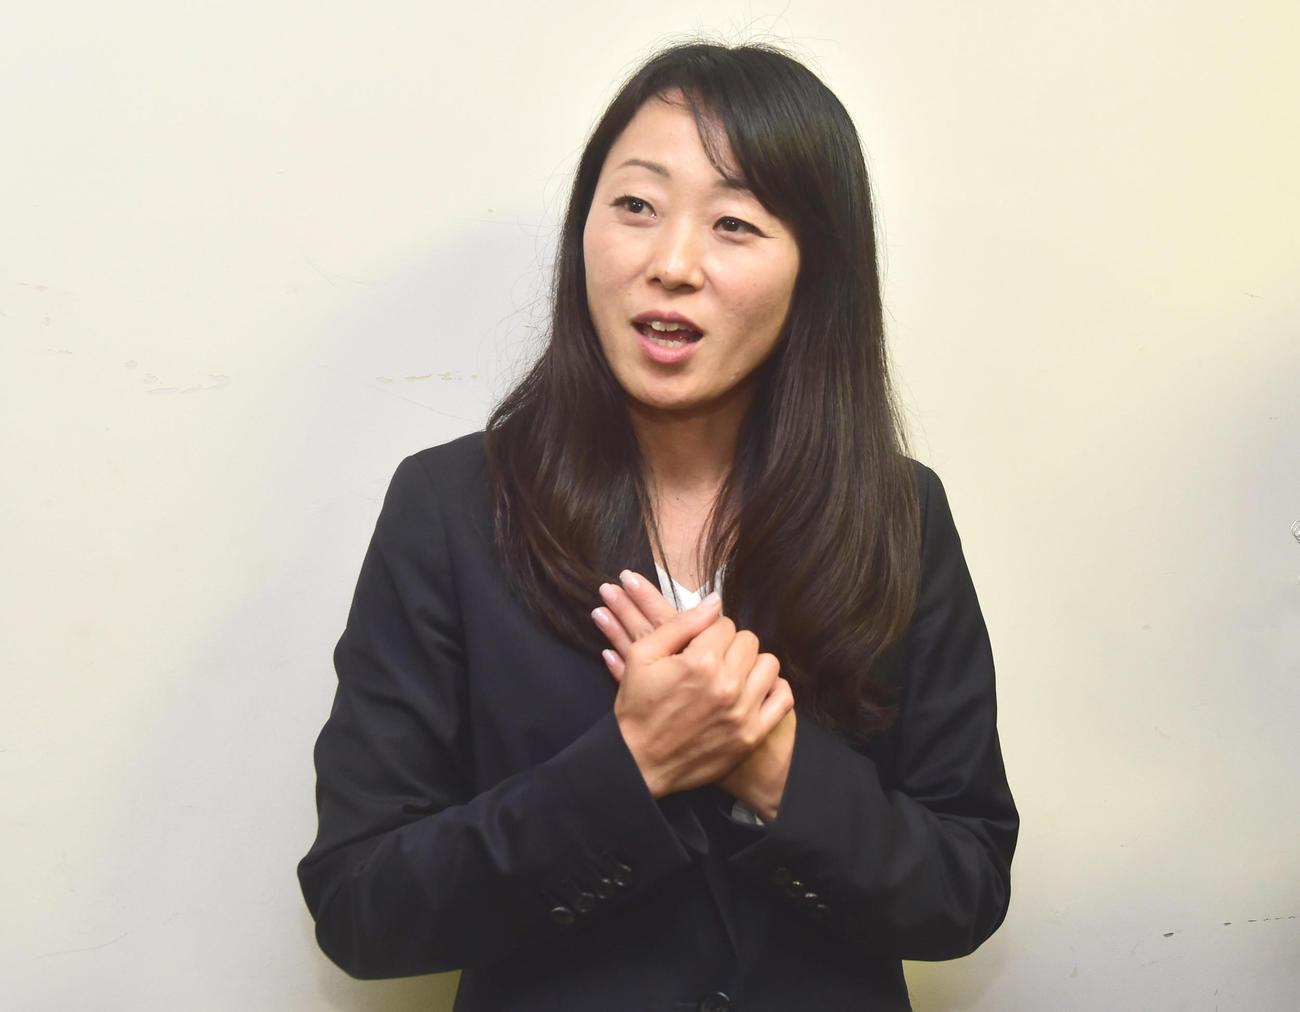 園田学園女子大教授の荒木香織さん